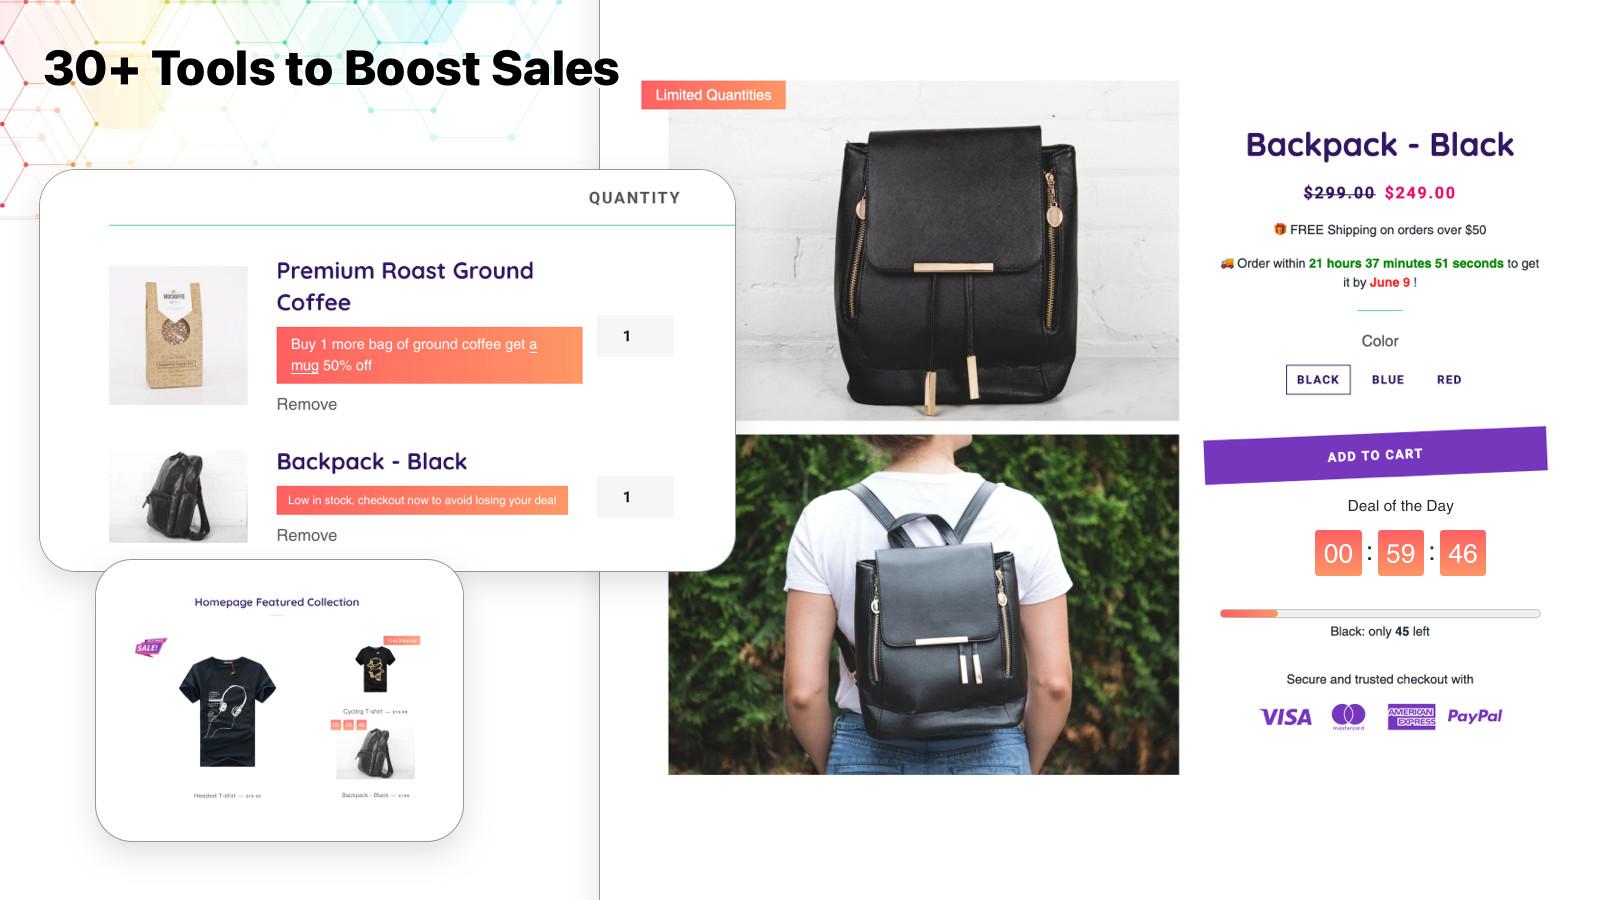 Ultimate Sales Boost